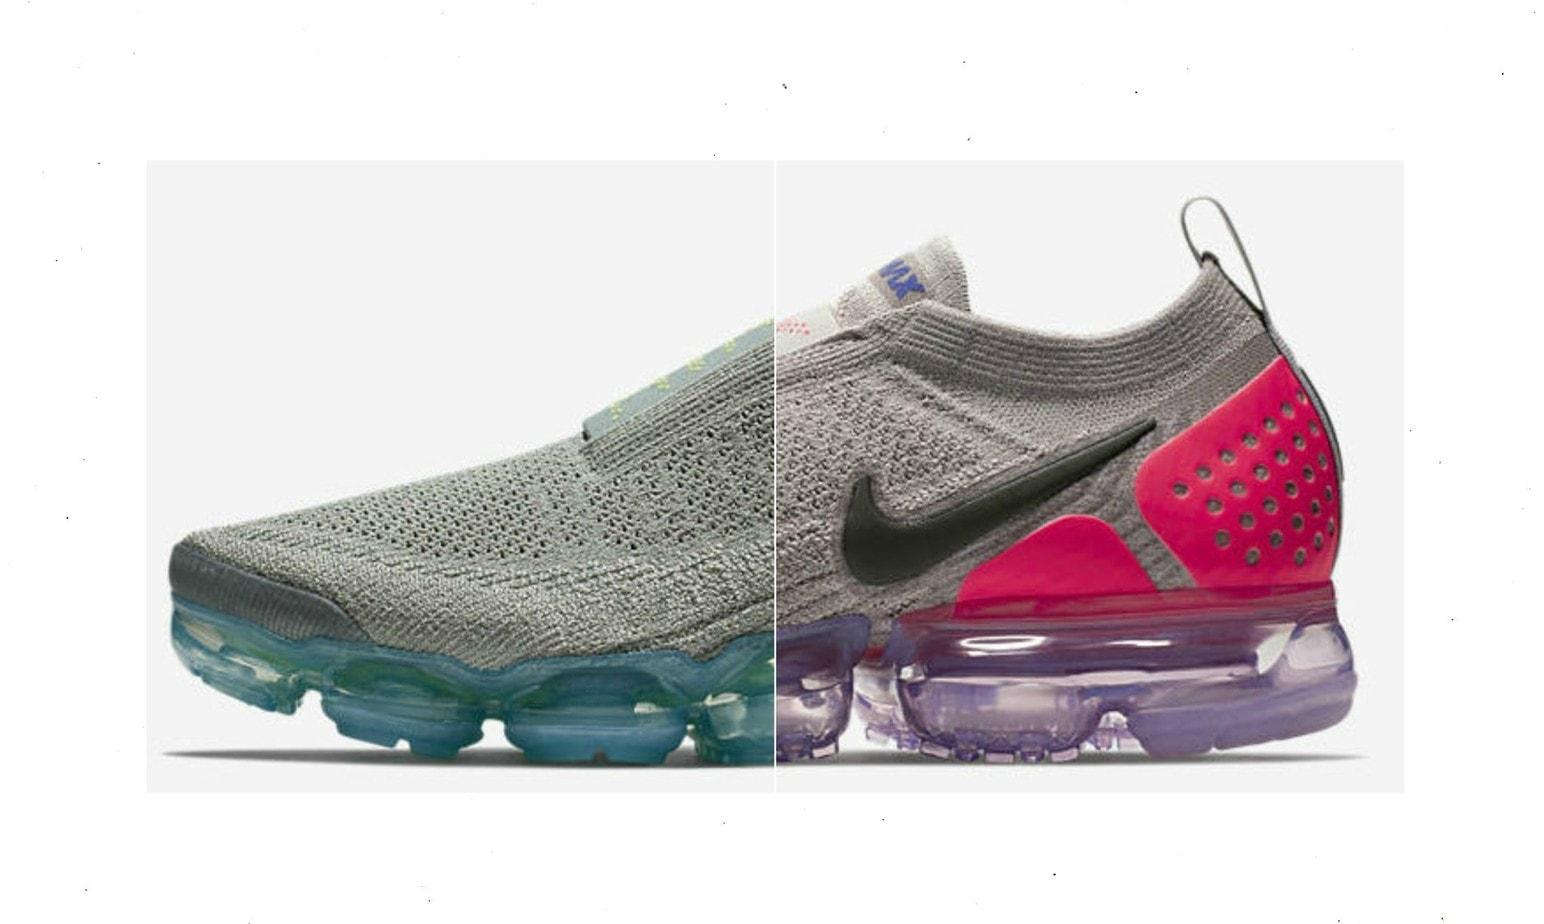 uk availability 8ef43 23899 Nike Air Vapormax Flyknit Moc 2.0 Release Info - JustFreshKi